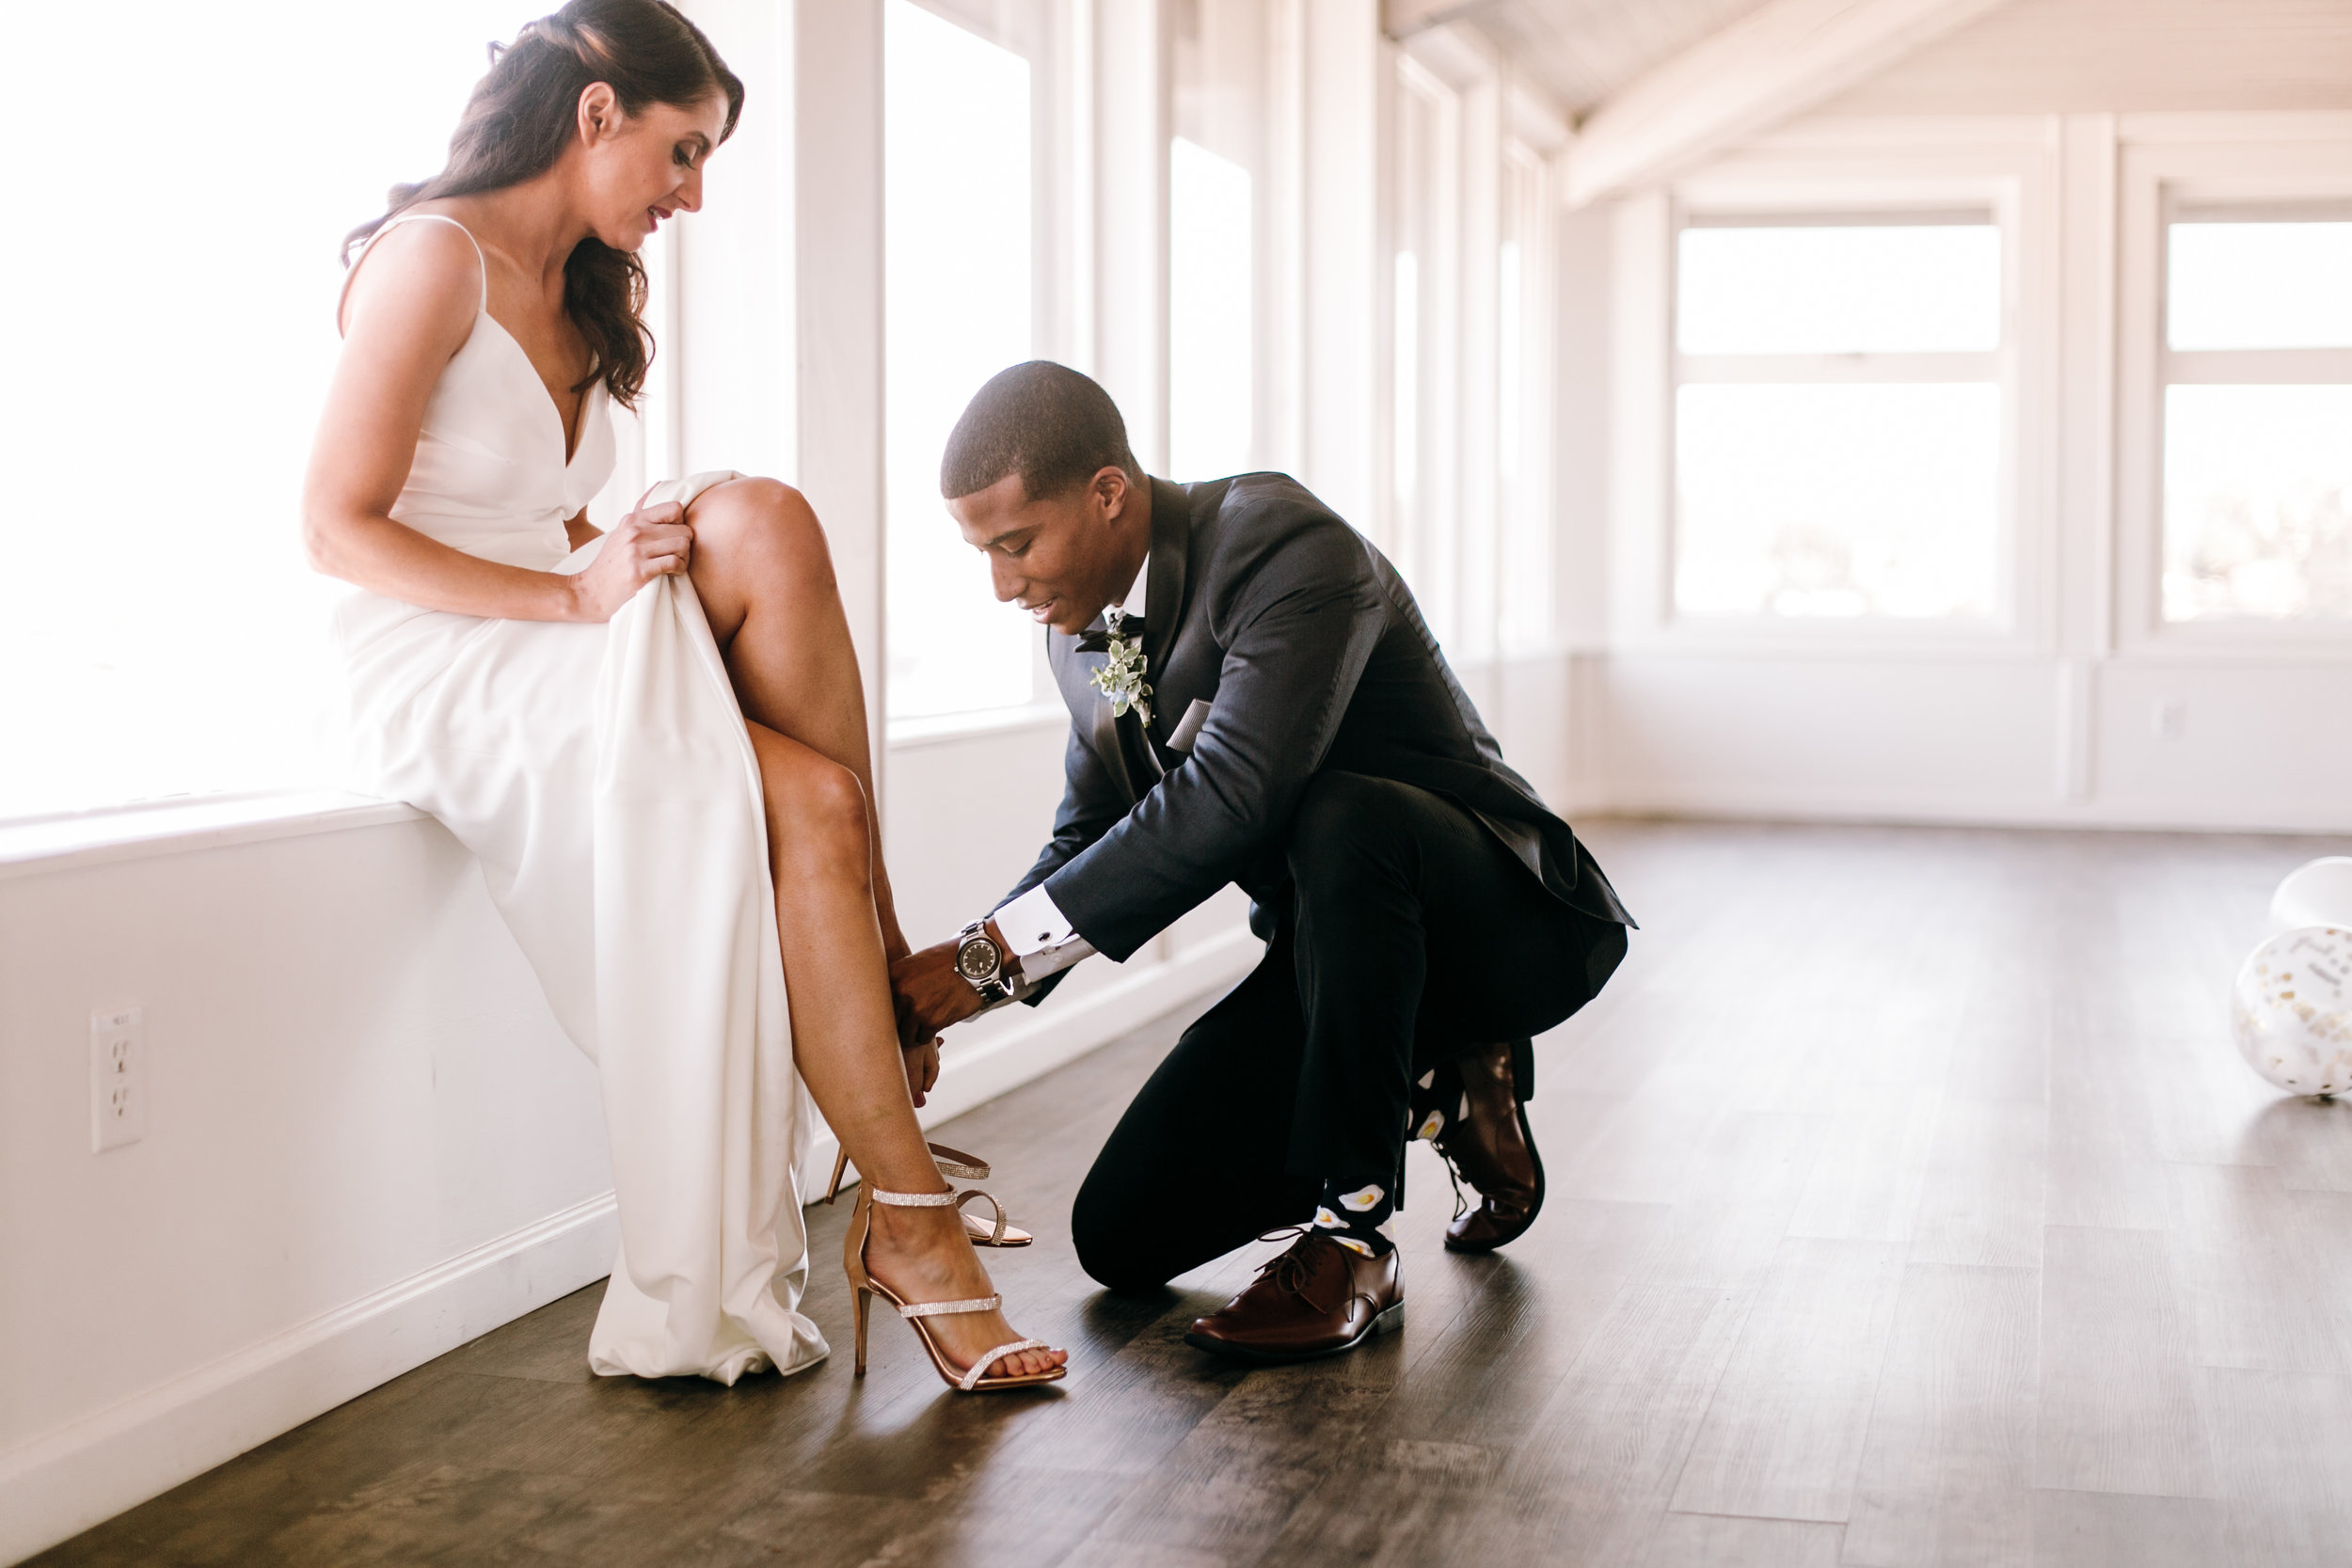 LA wedding photographer, Southern California wedding photographer, Los Angeles wedding photographer, SoCal wedding photographer, Beverly Hills wedding photographer, OC wedding photographer